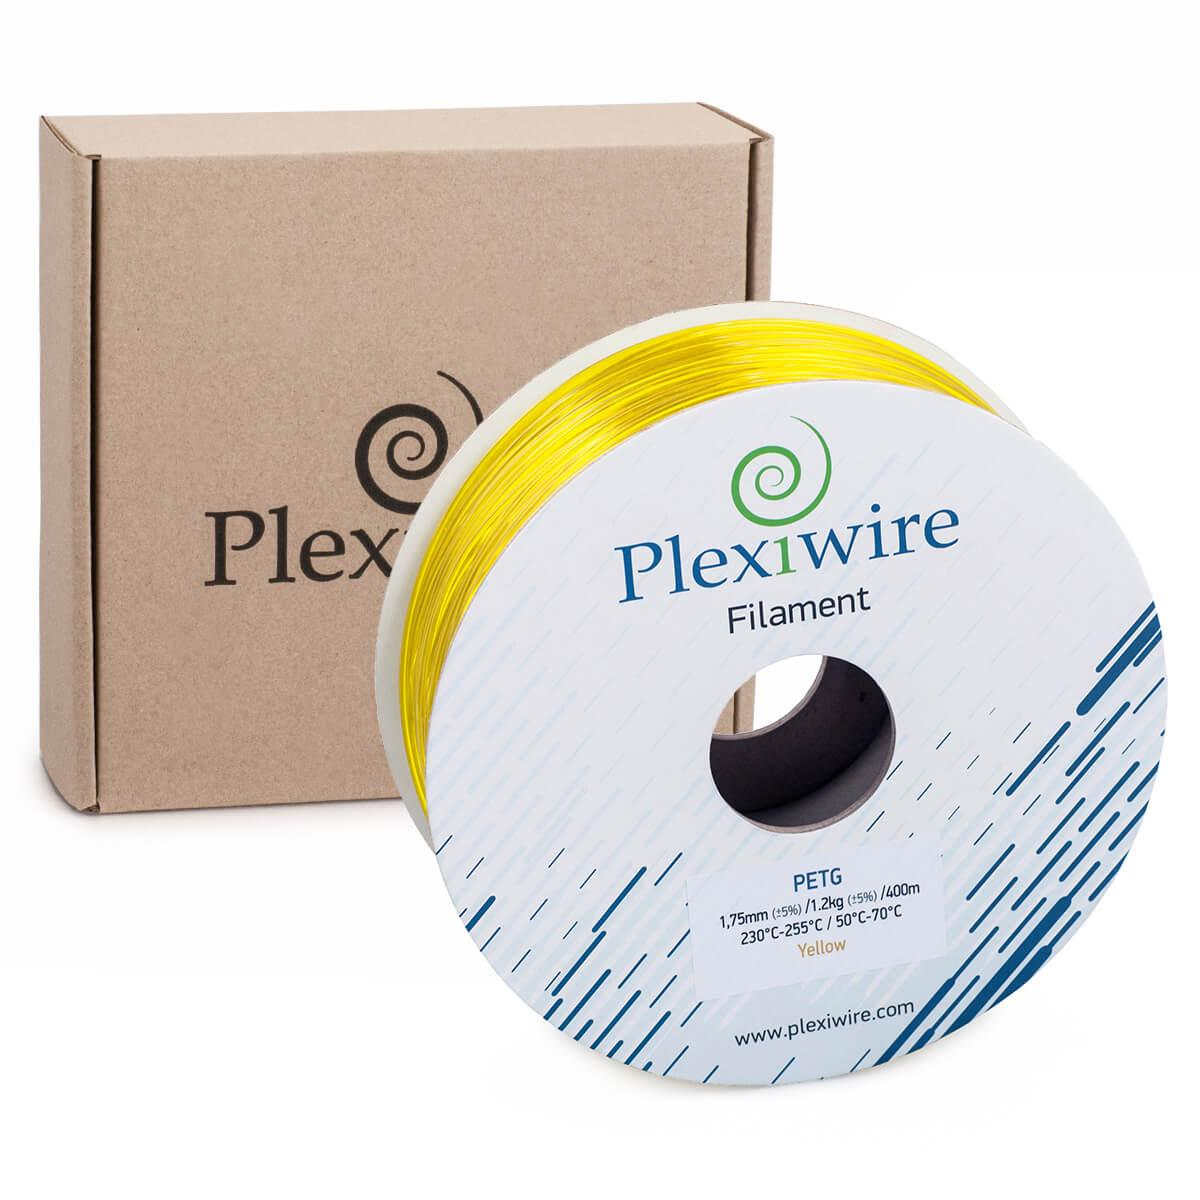 PETG пластик для 3D принтера Жовтий 1,75 мм (400 м / 1.2 кг)